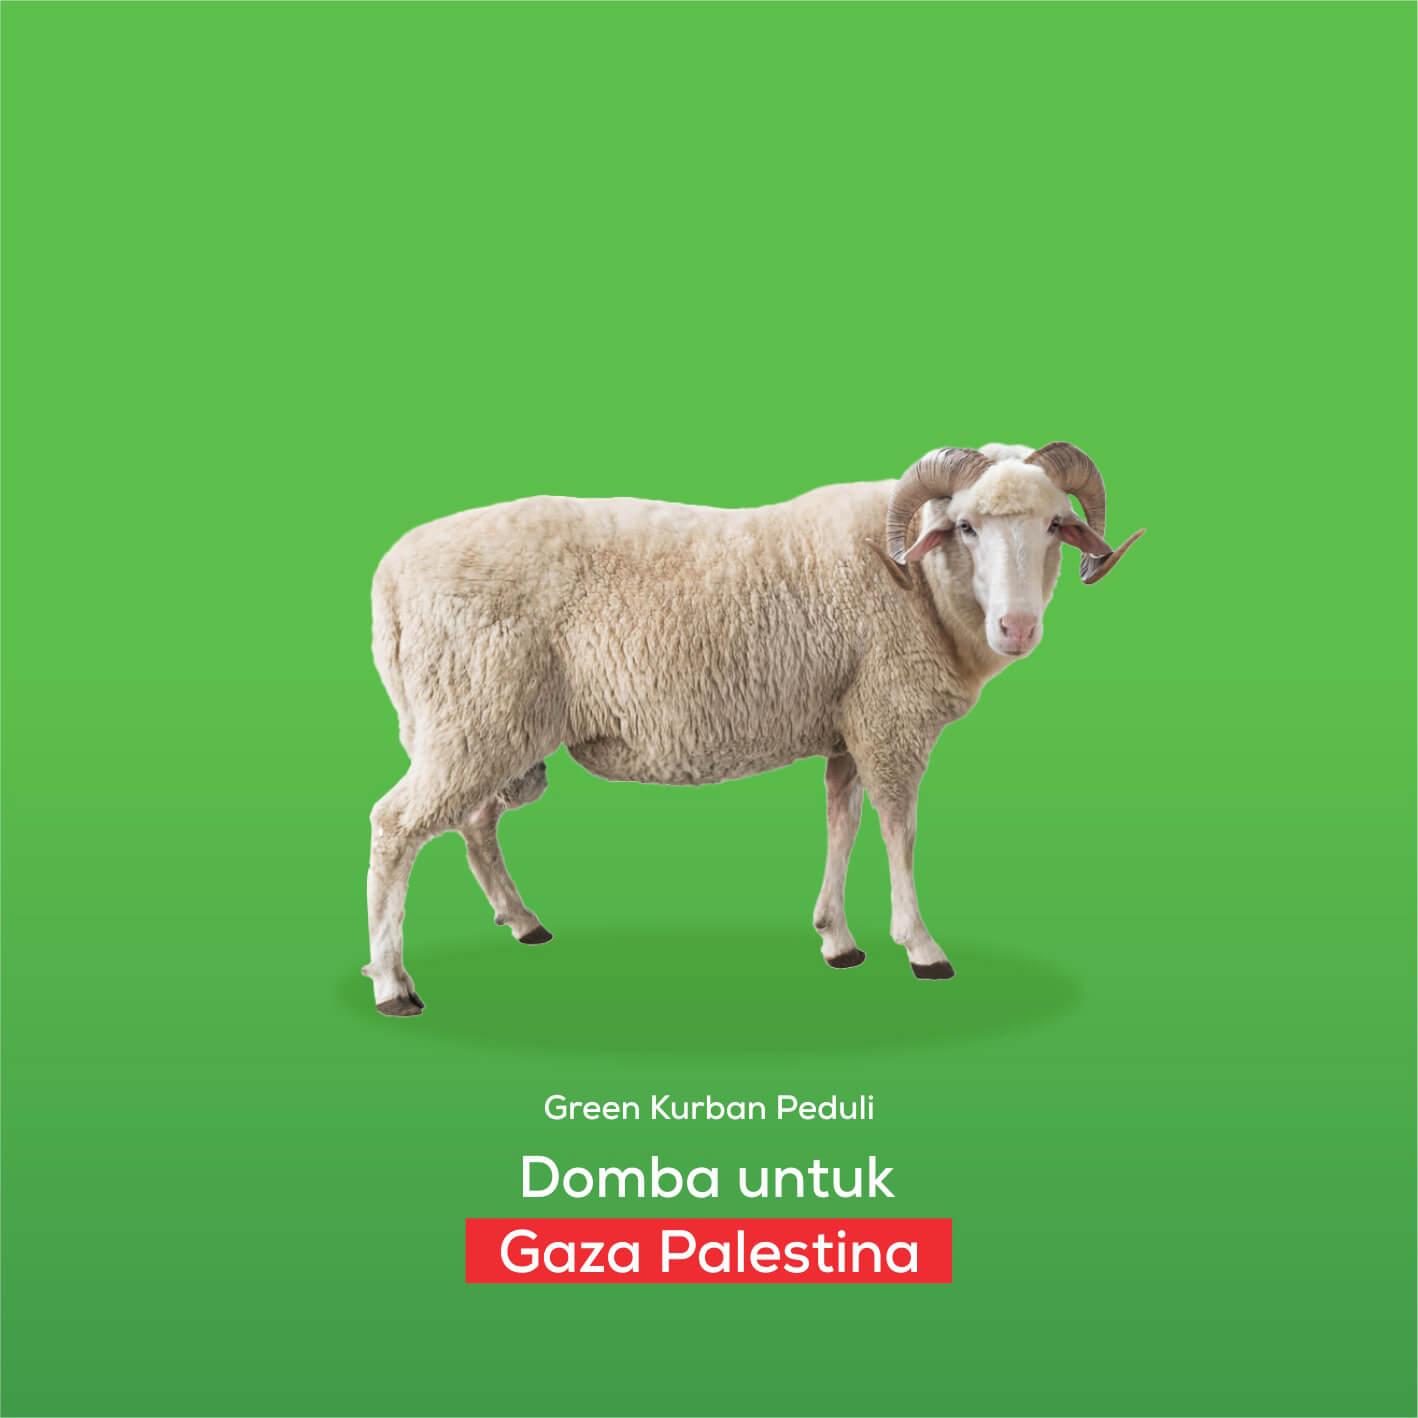 Green Kurban Peduli | Domba Gaza